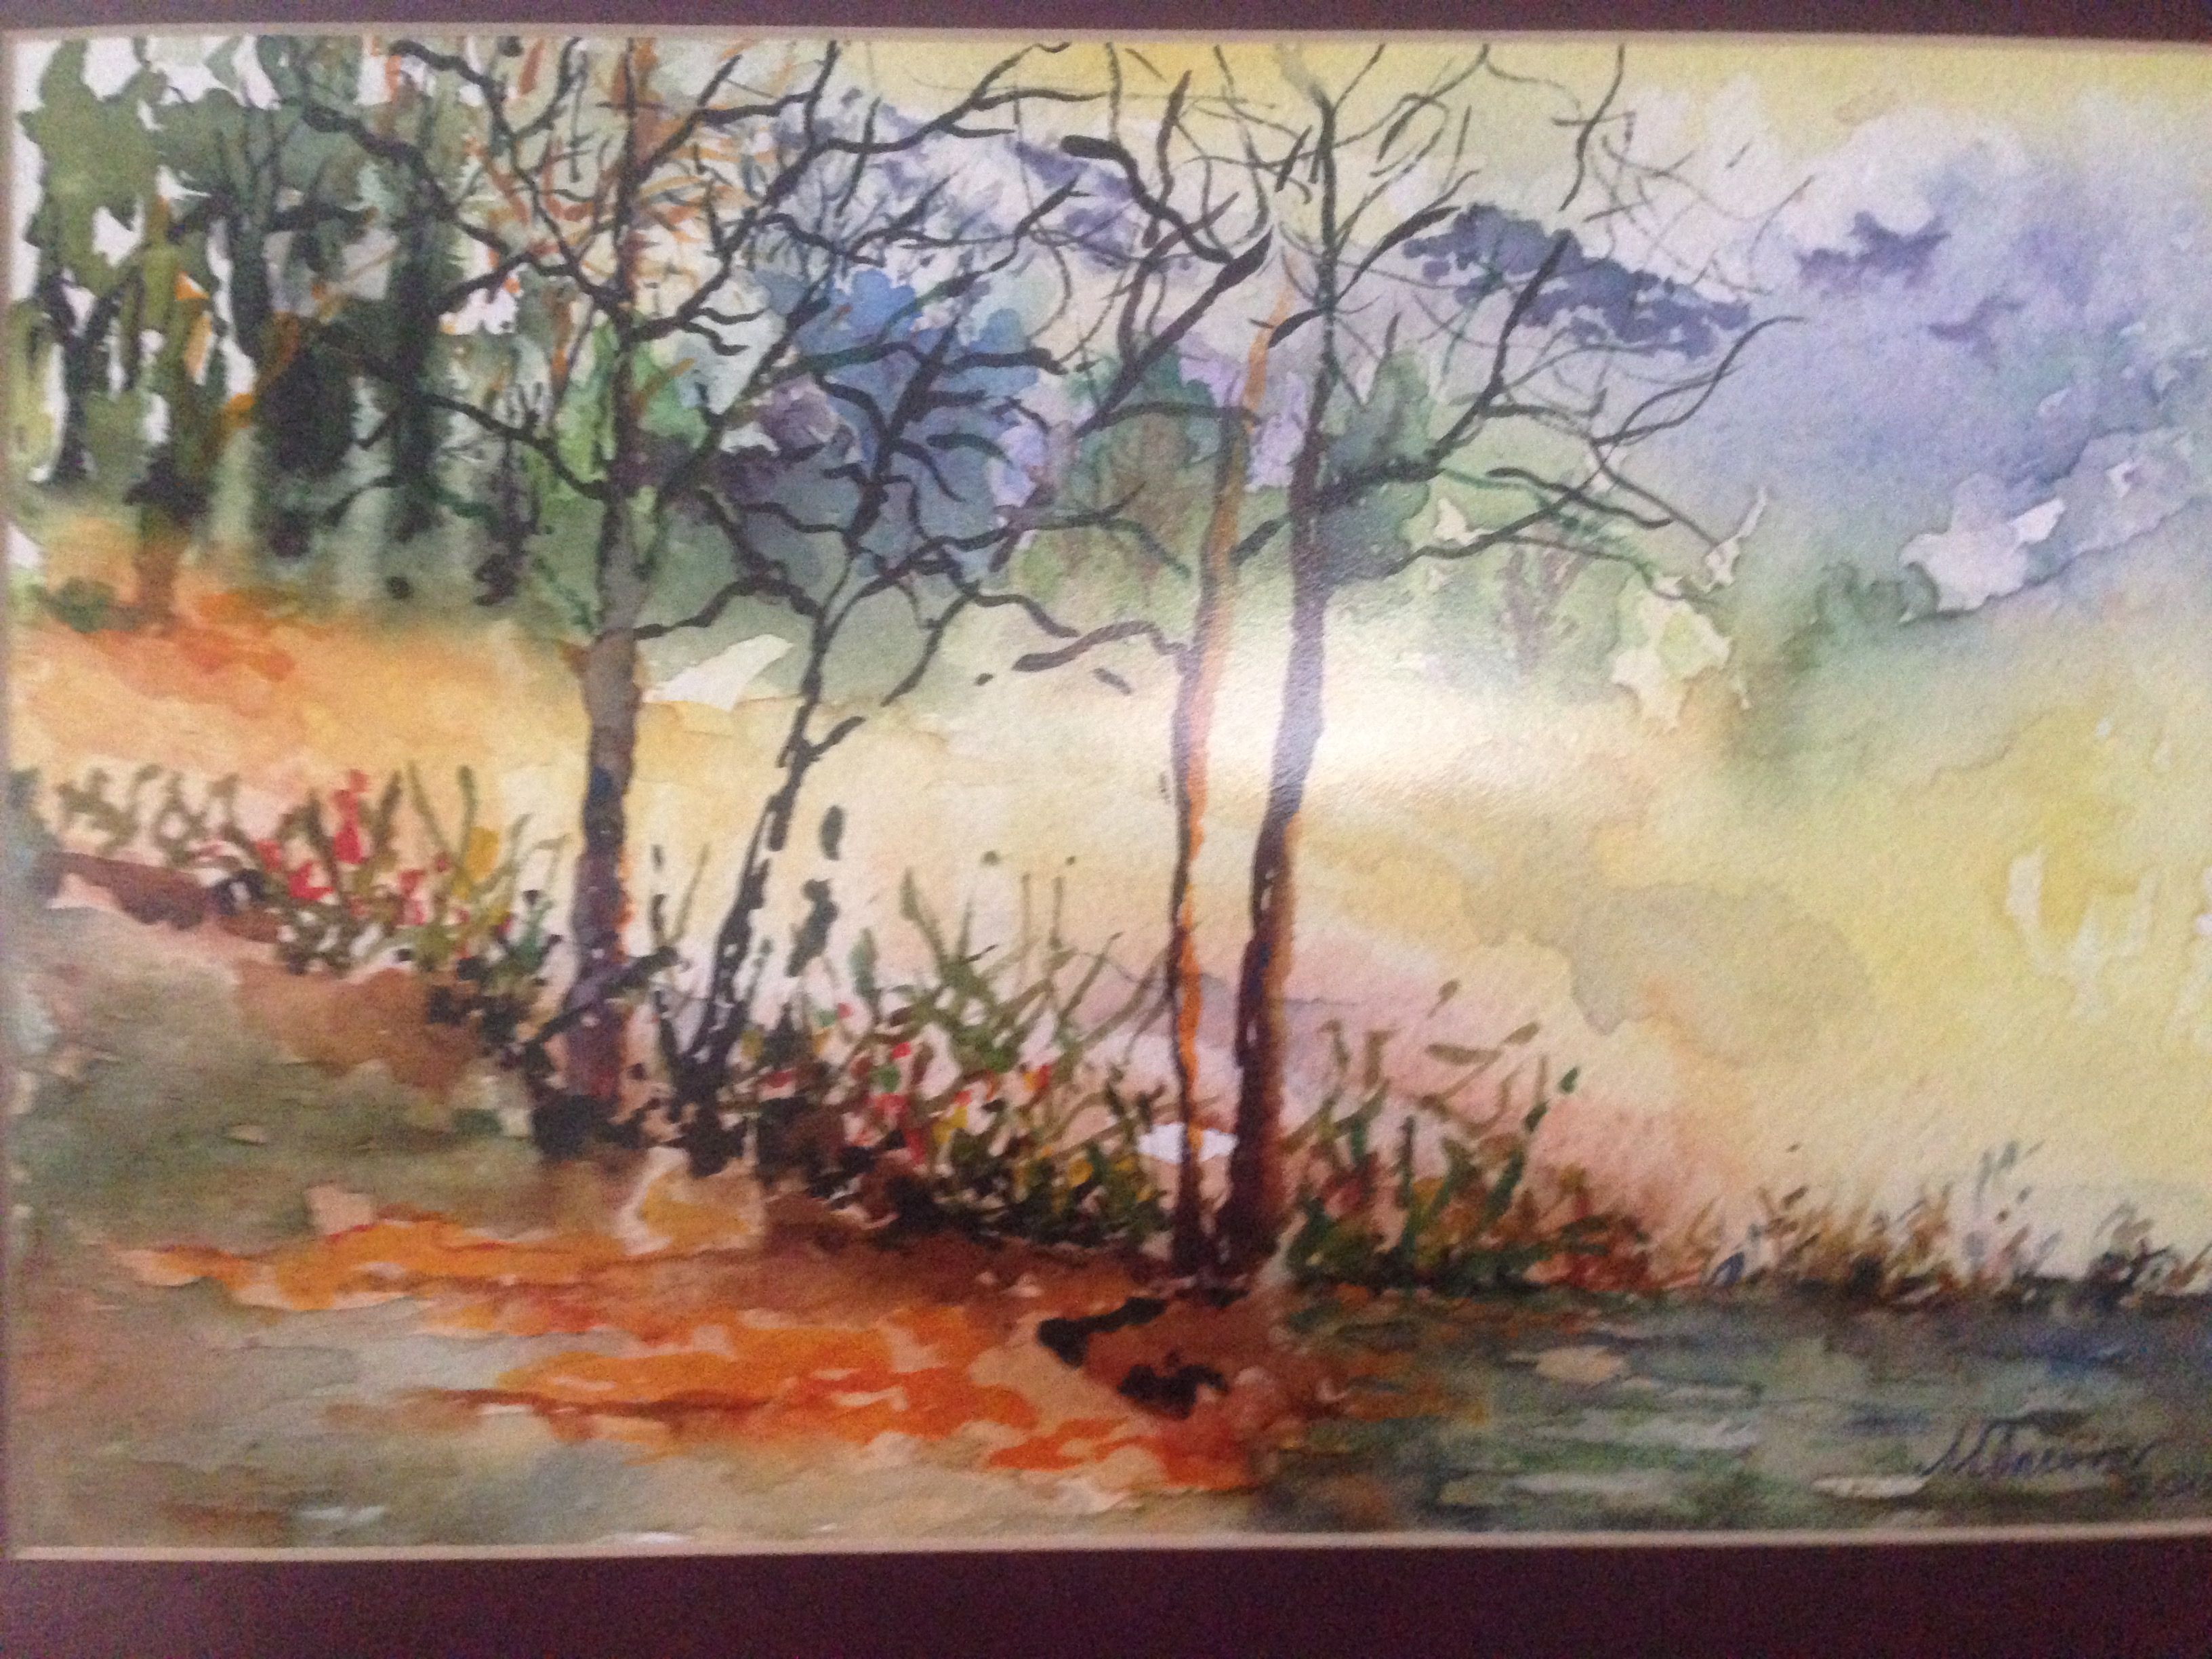 Aquarellmalerei Bildergalerie Landschaften Aulandschaft 12